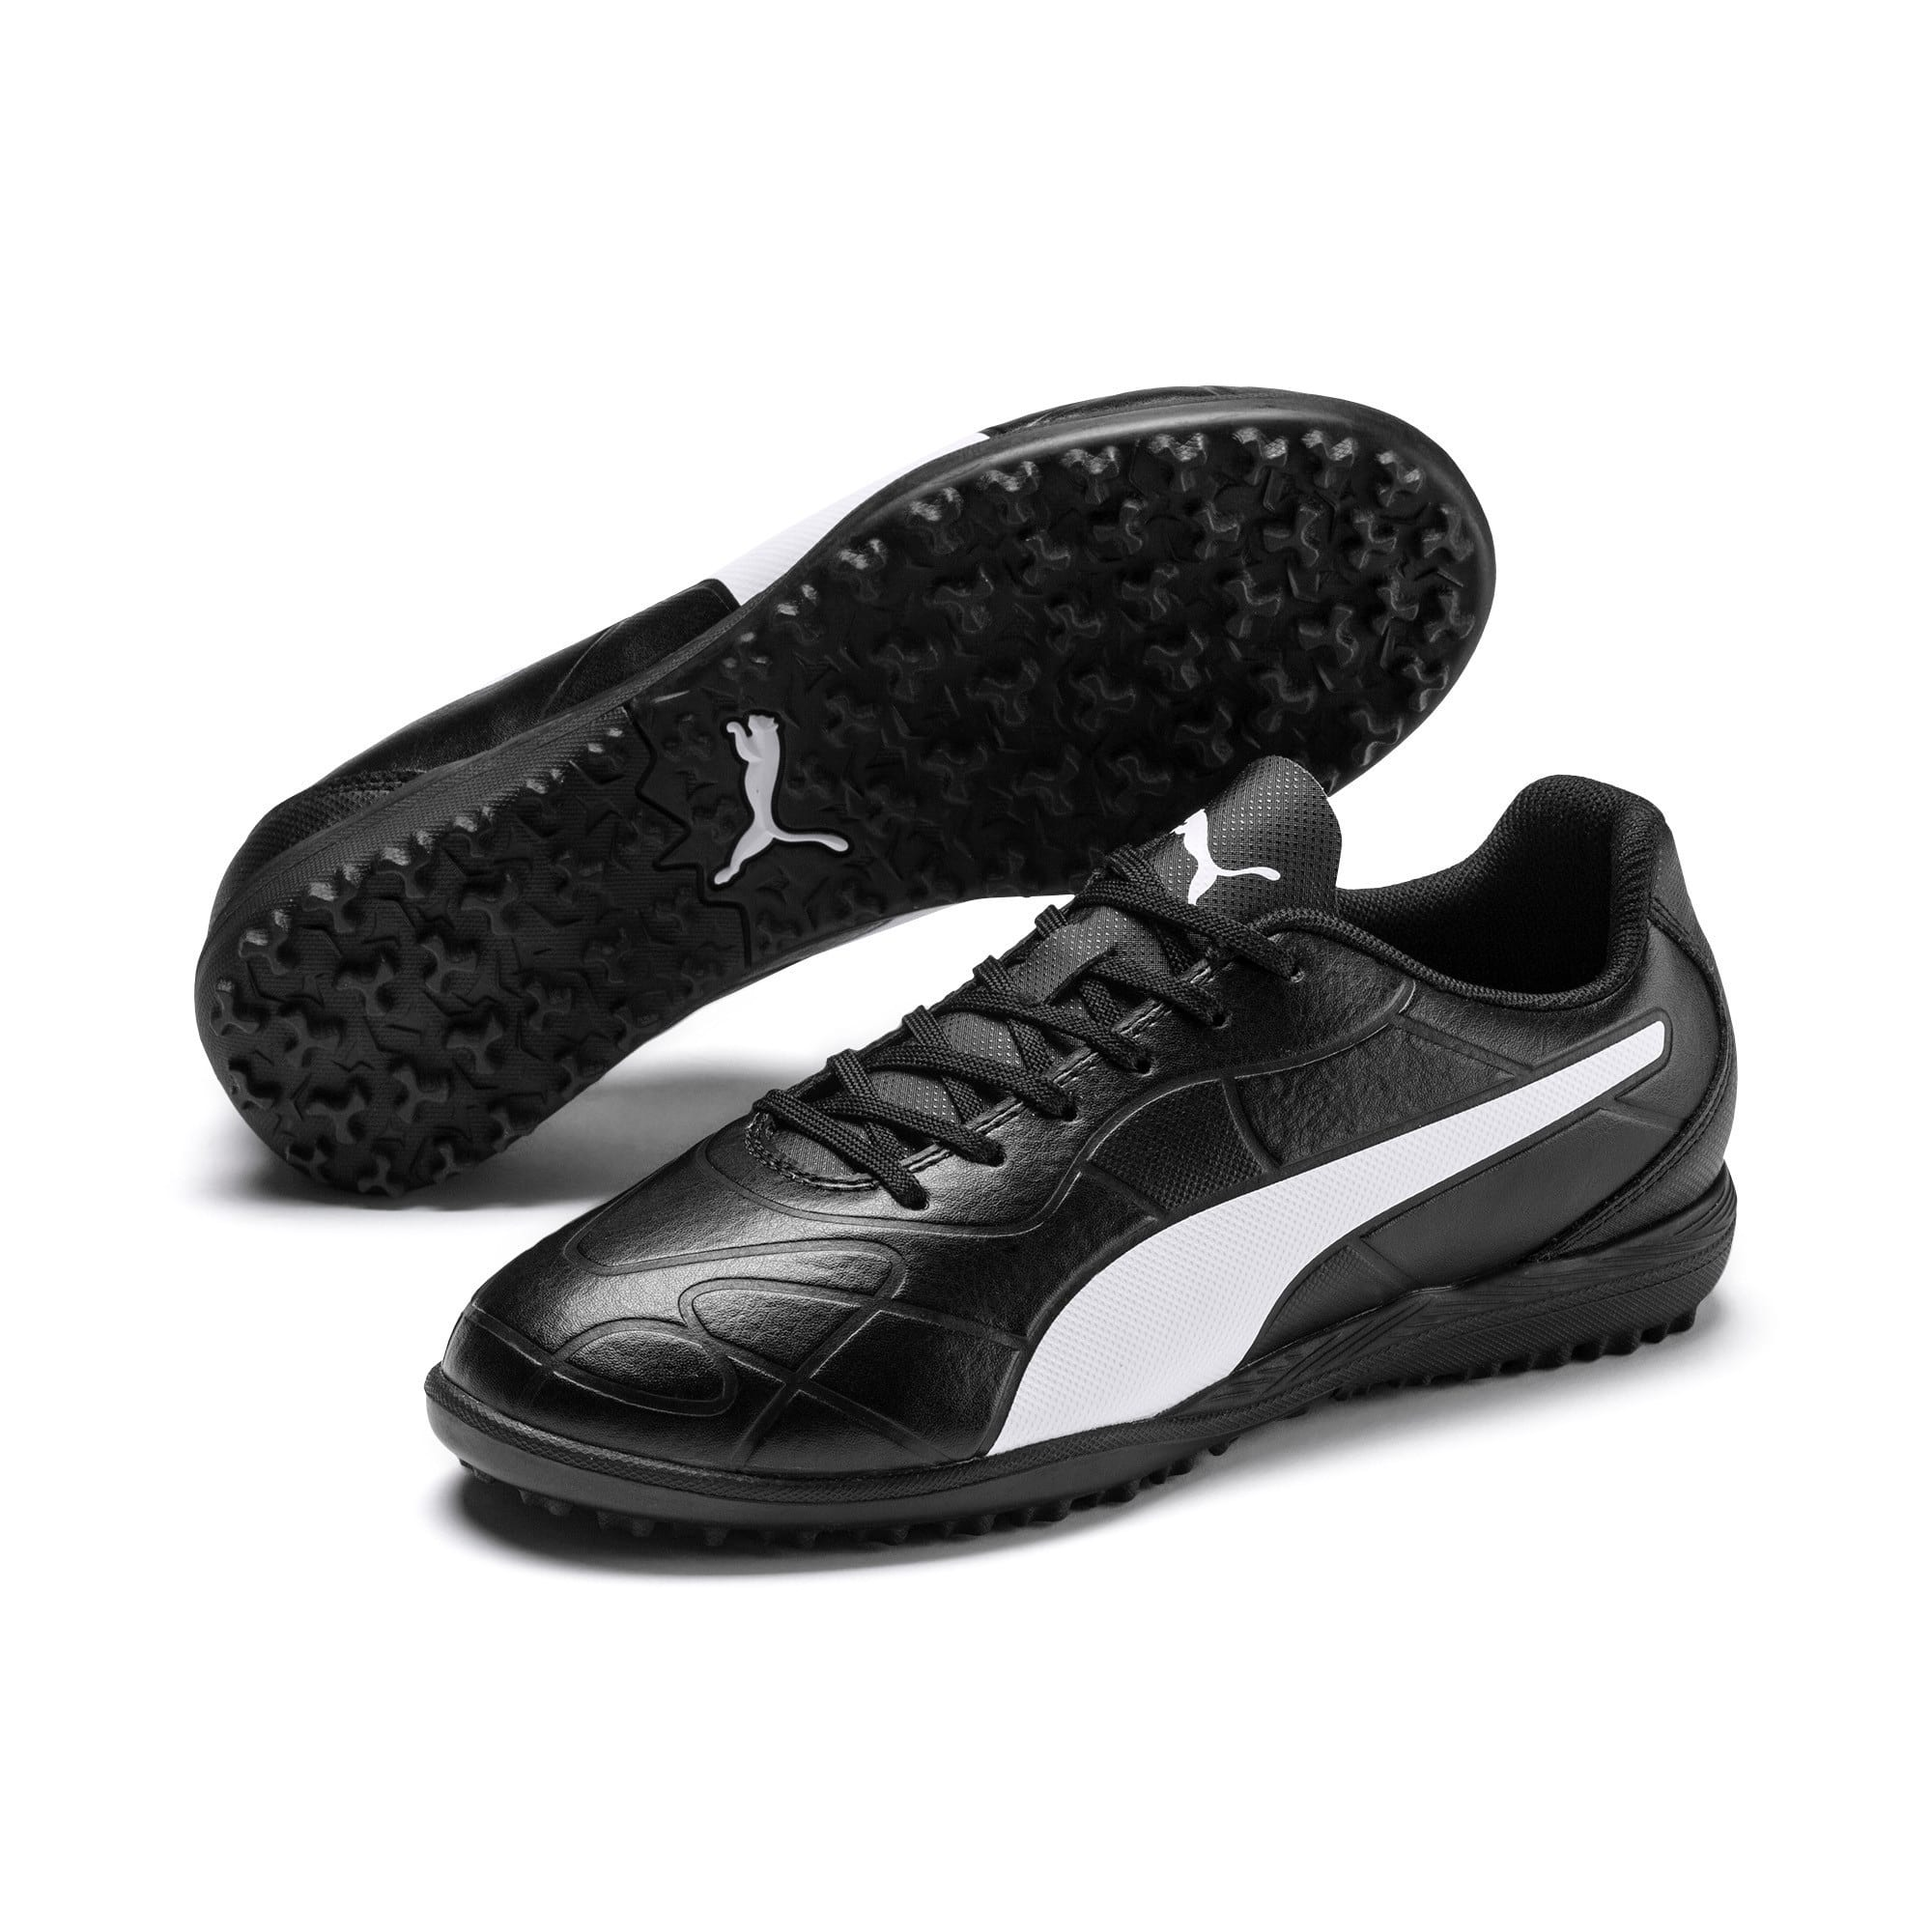 Thumbnail 6 of Monarch TT Youth Football Boots, Puma Black-Puma White, medium-IND